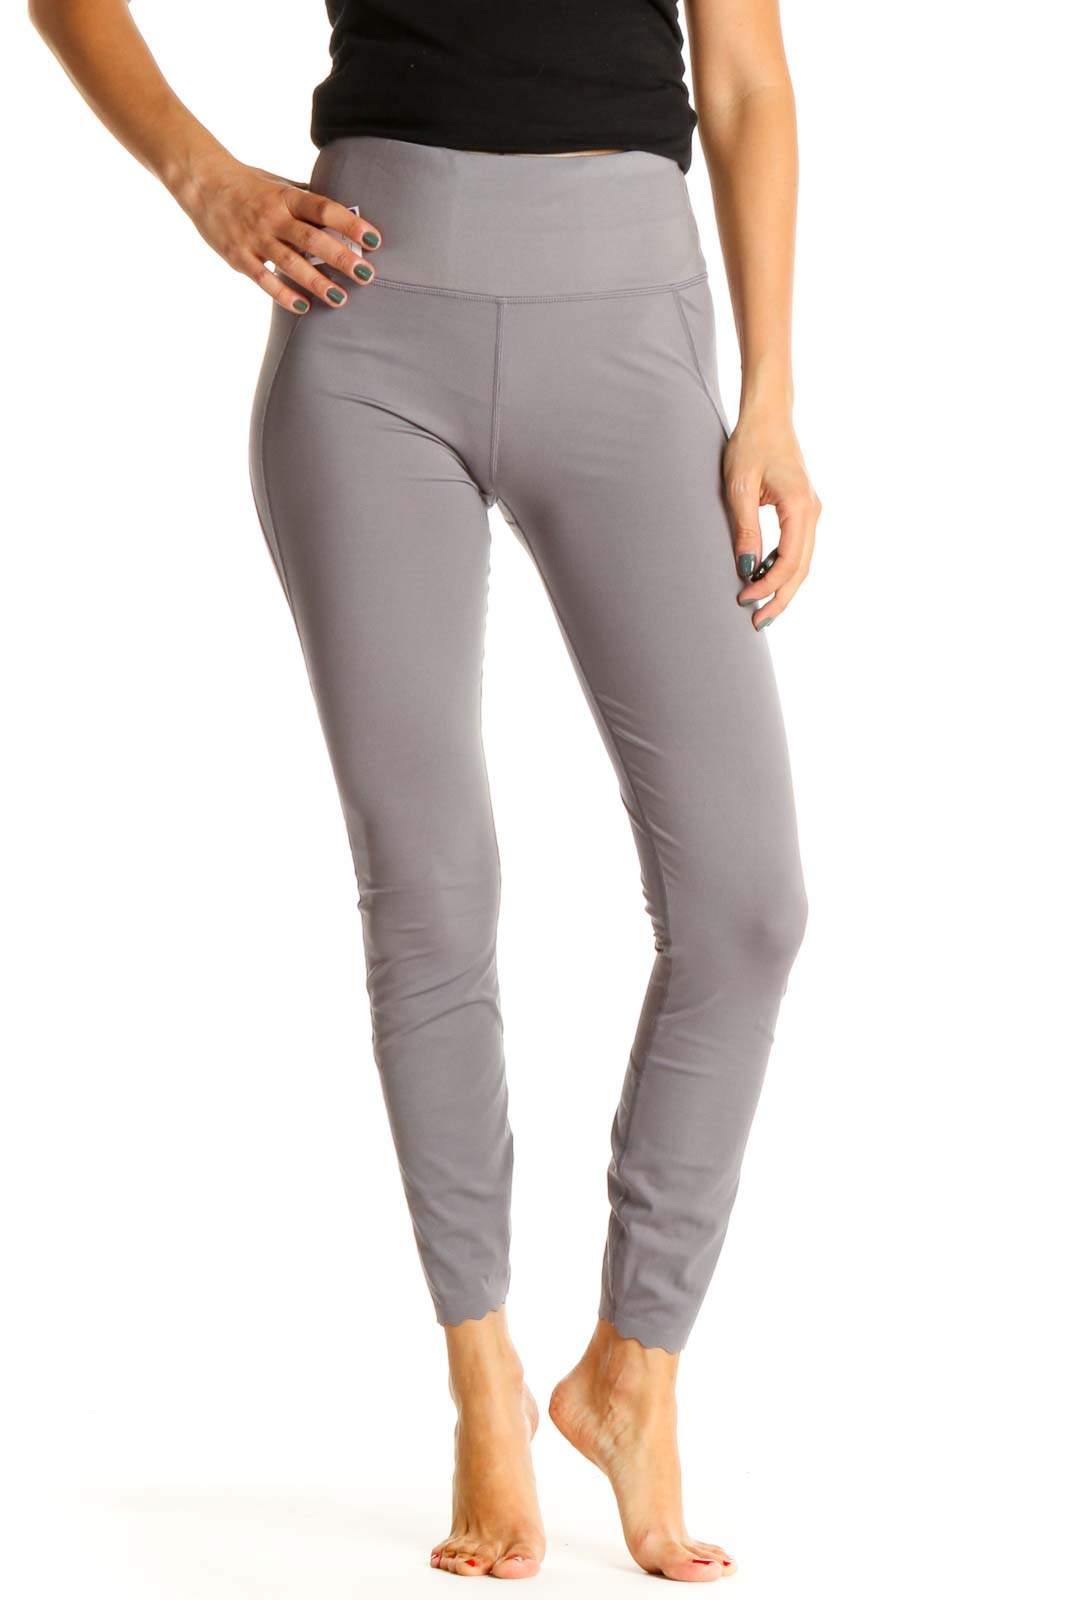 Gray Purple Activewear Leggings Front